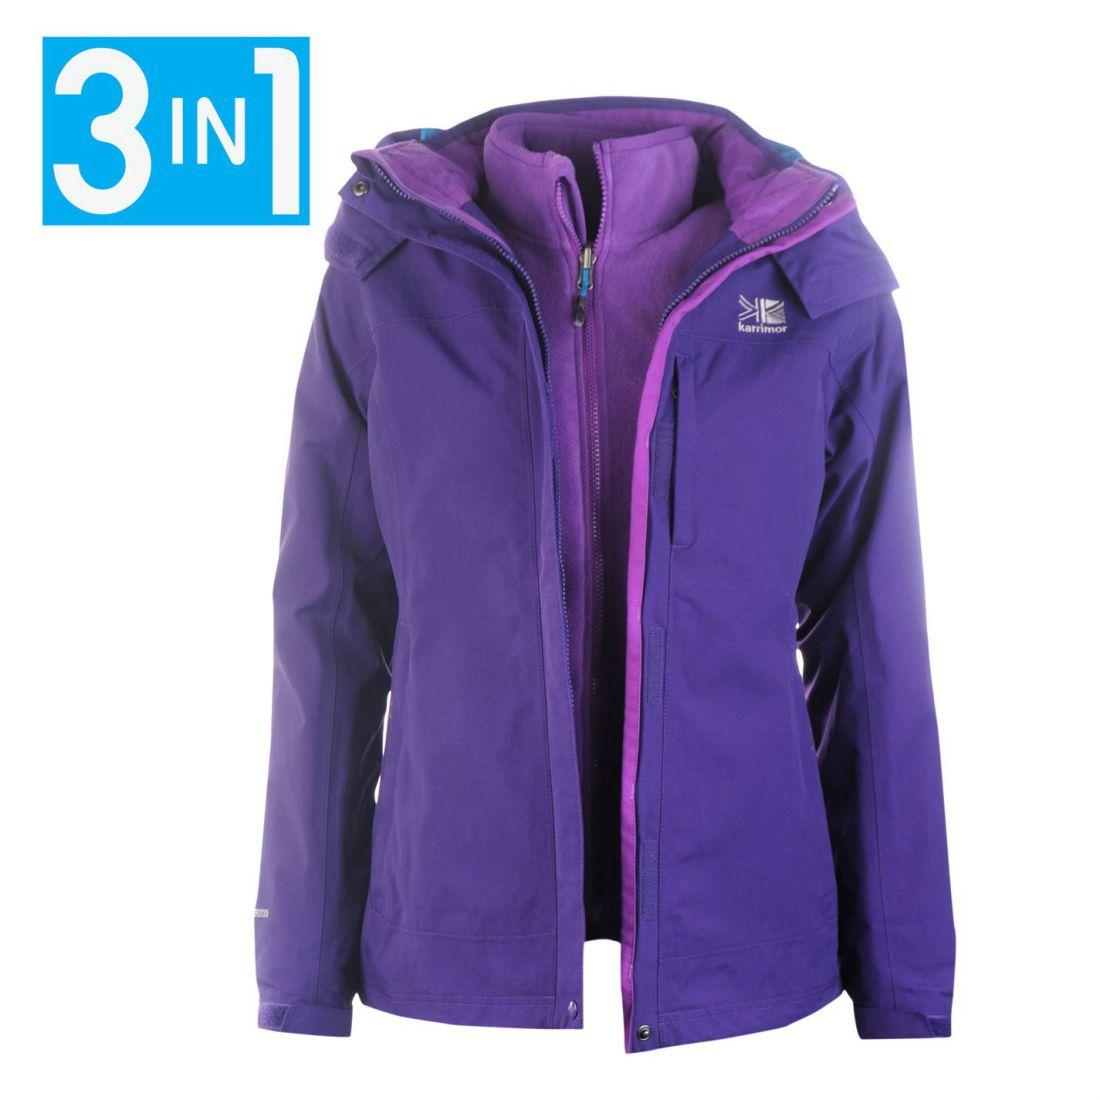 74e7e7760ecd Karrimor Womens 3in1 Jacket Coat Top Ladies Hooded Fleece Mesh ...